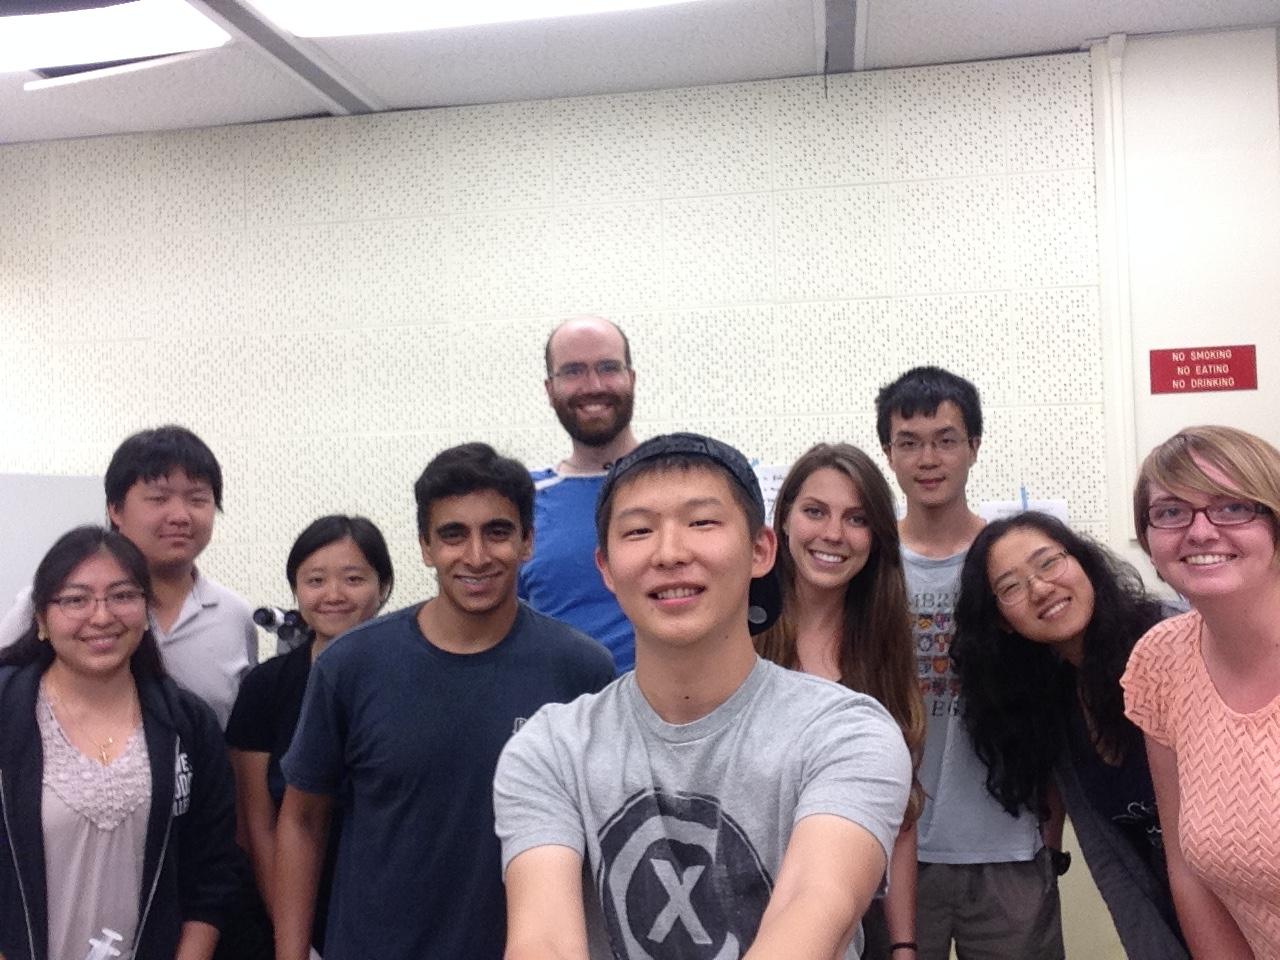 Myco-Fluidics Lab wins NSF video competition